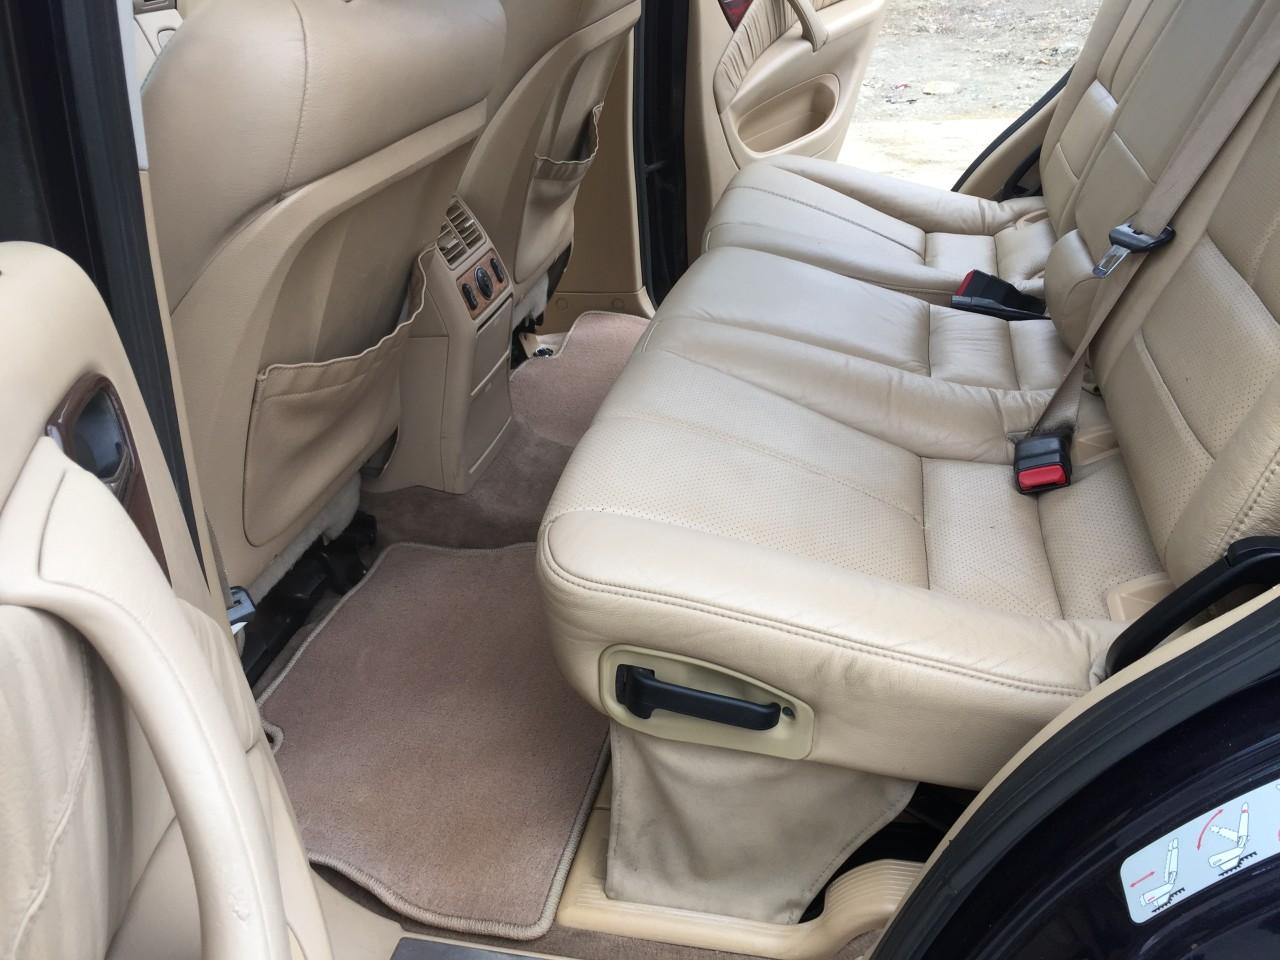 Mercedes 270 Full Option Cutie MANUALA INMATRICULAT 1 ZI 2004